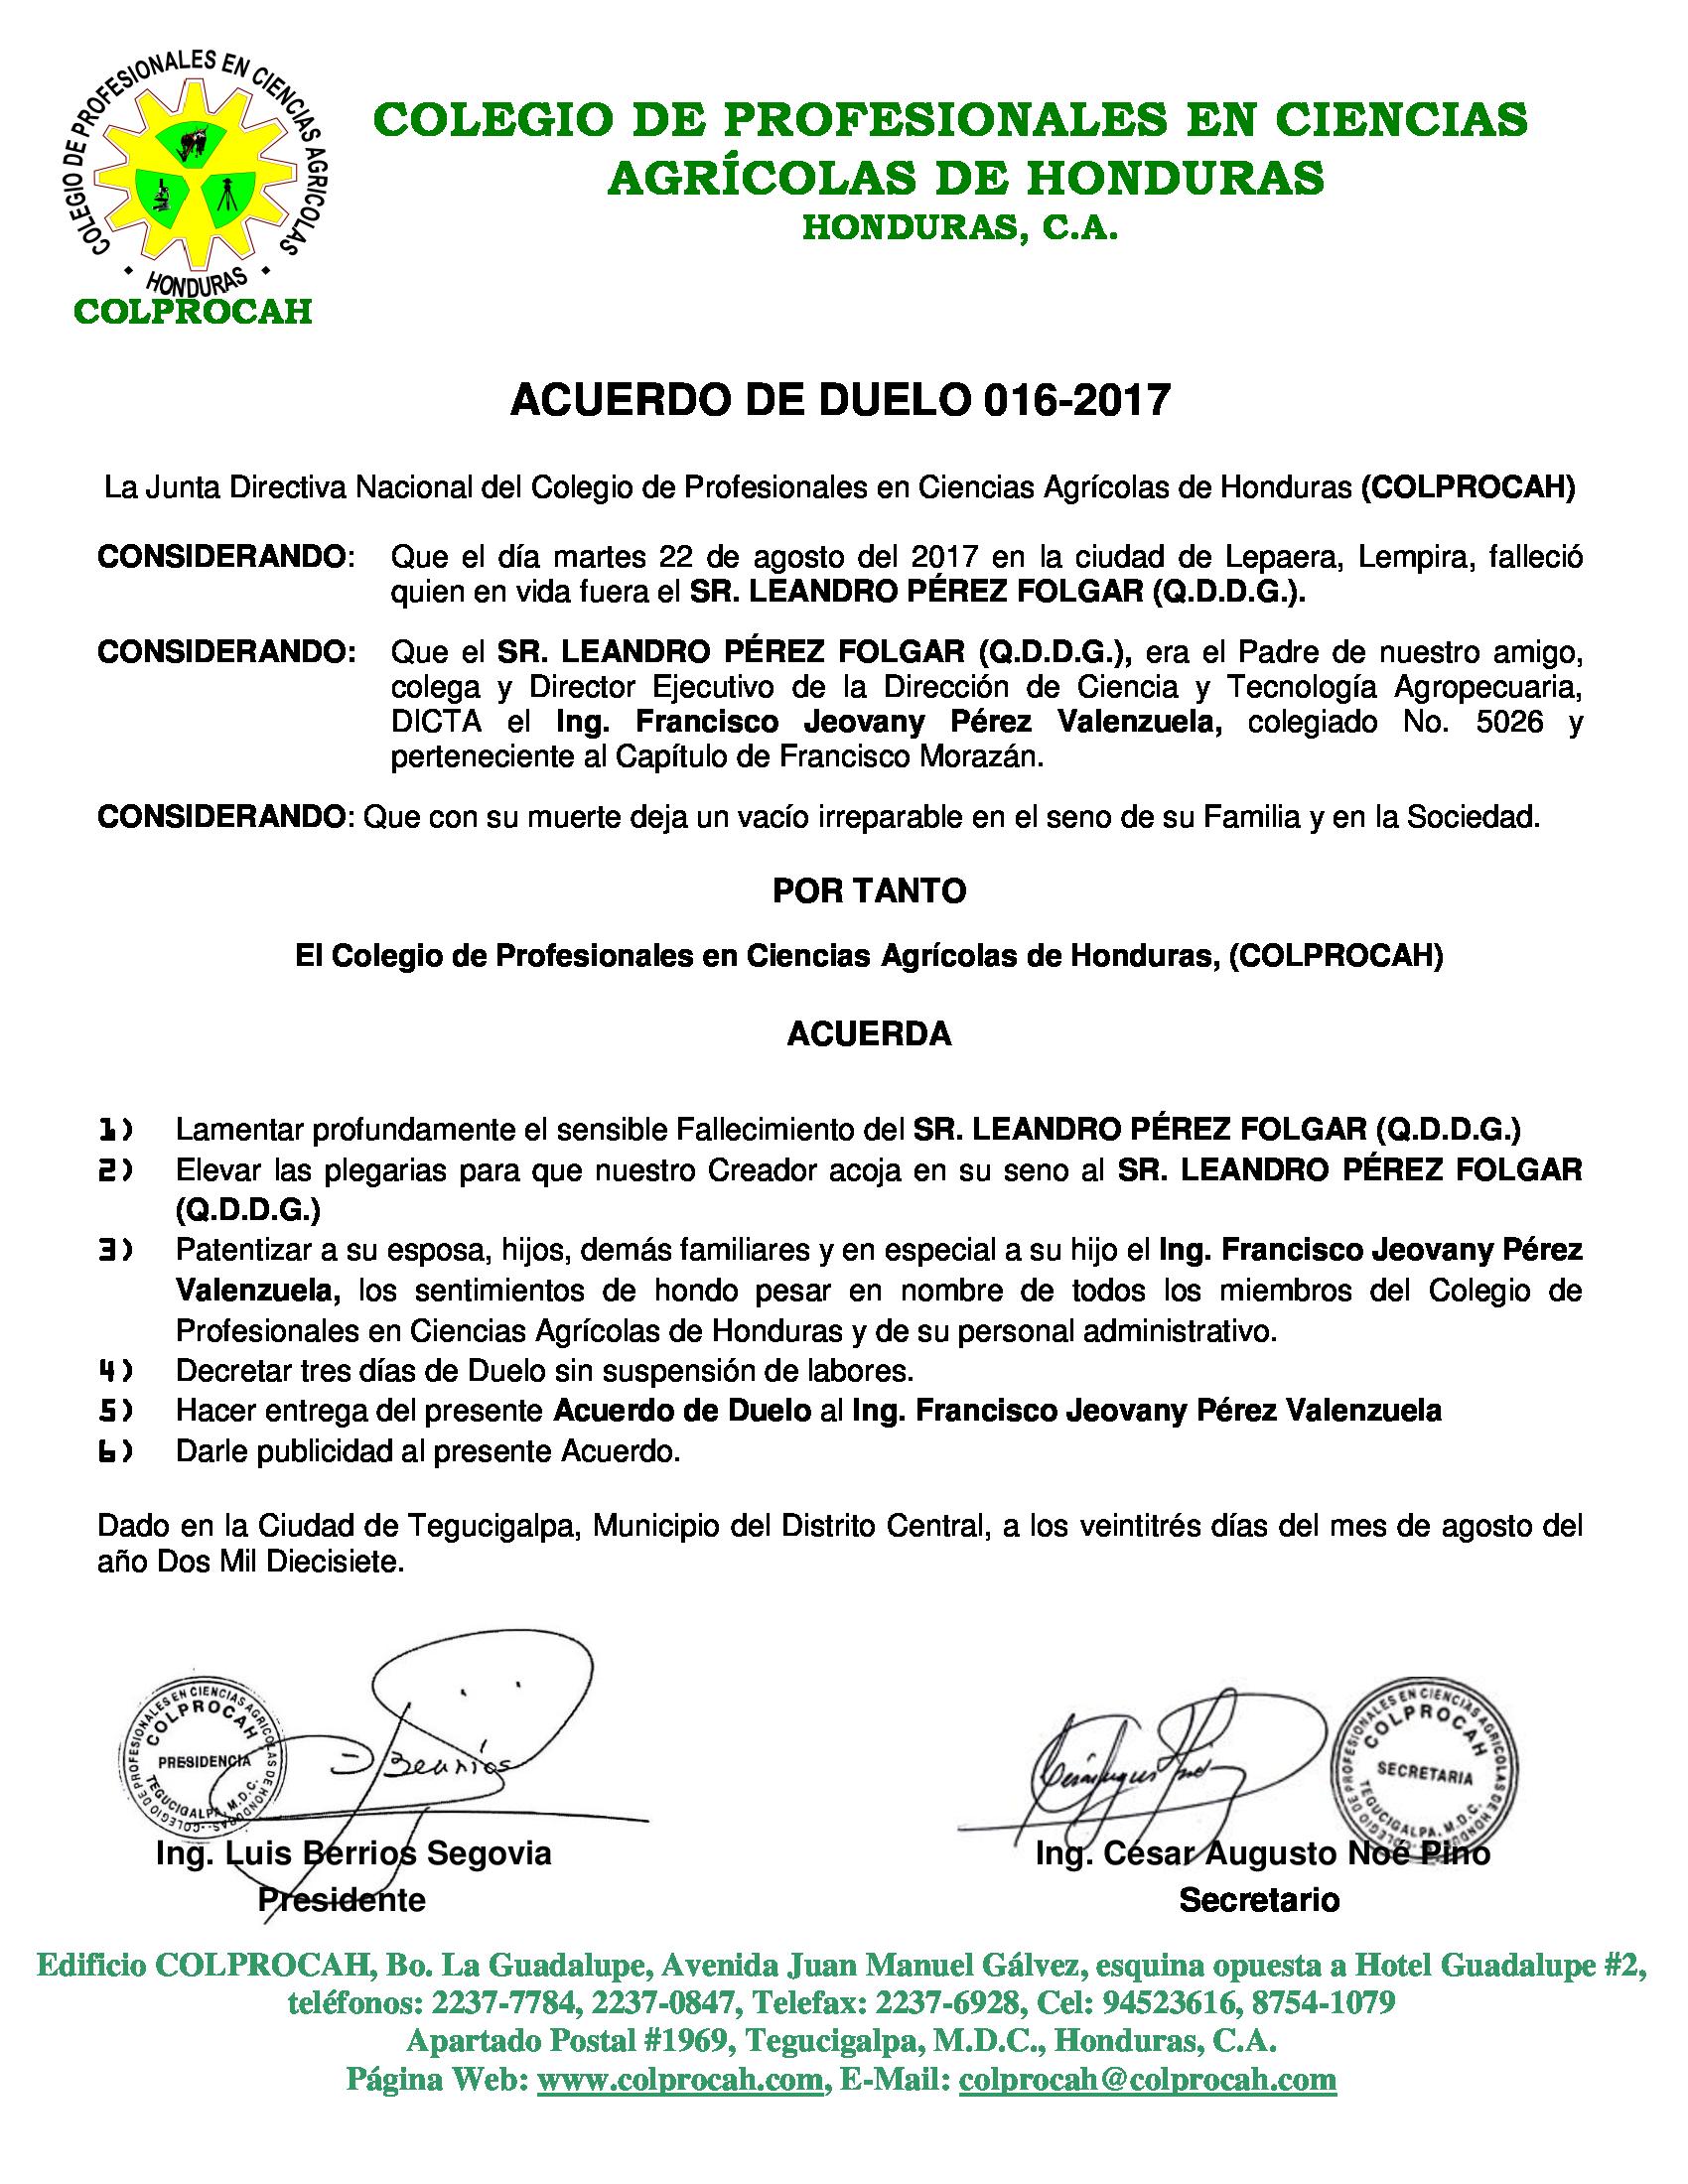 Acuerdo de Duelo 016 SR. LEANDRO PEREZ FOLGAR (PADRE DEL ING. JEOVANY PEREZ VALENZUELA)